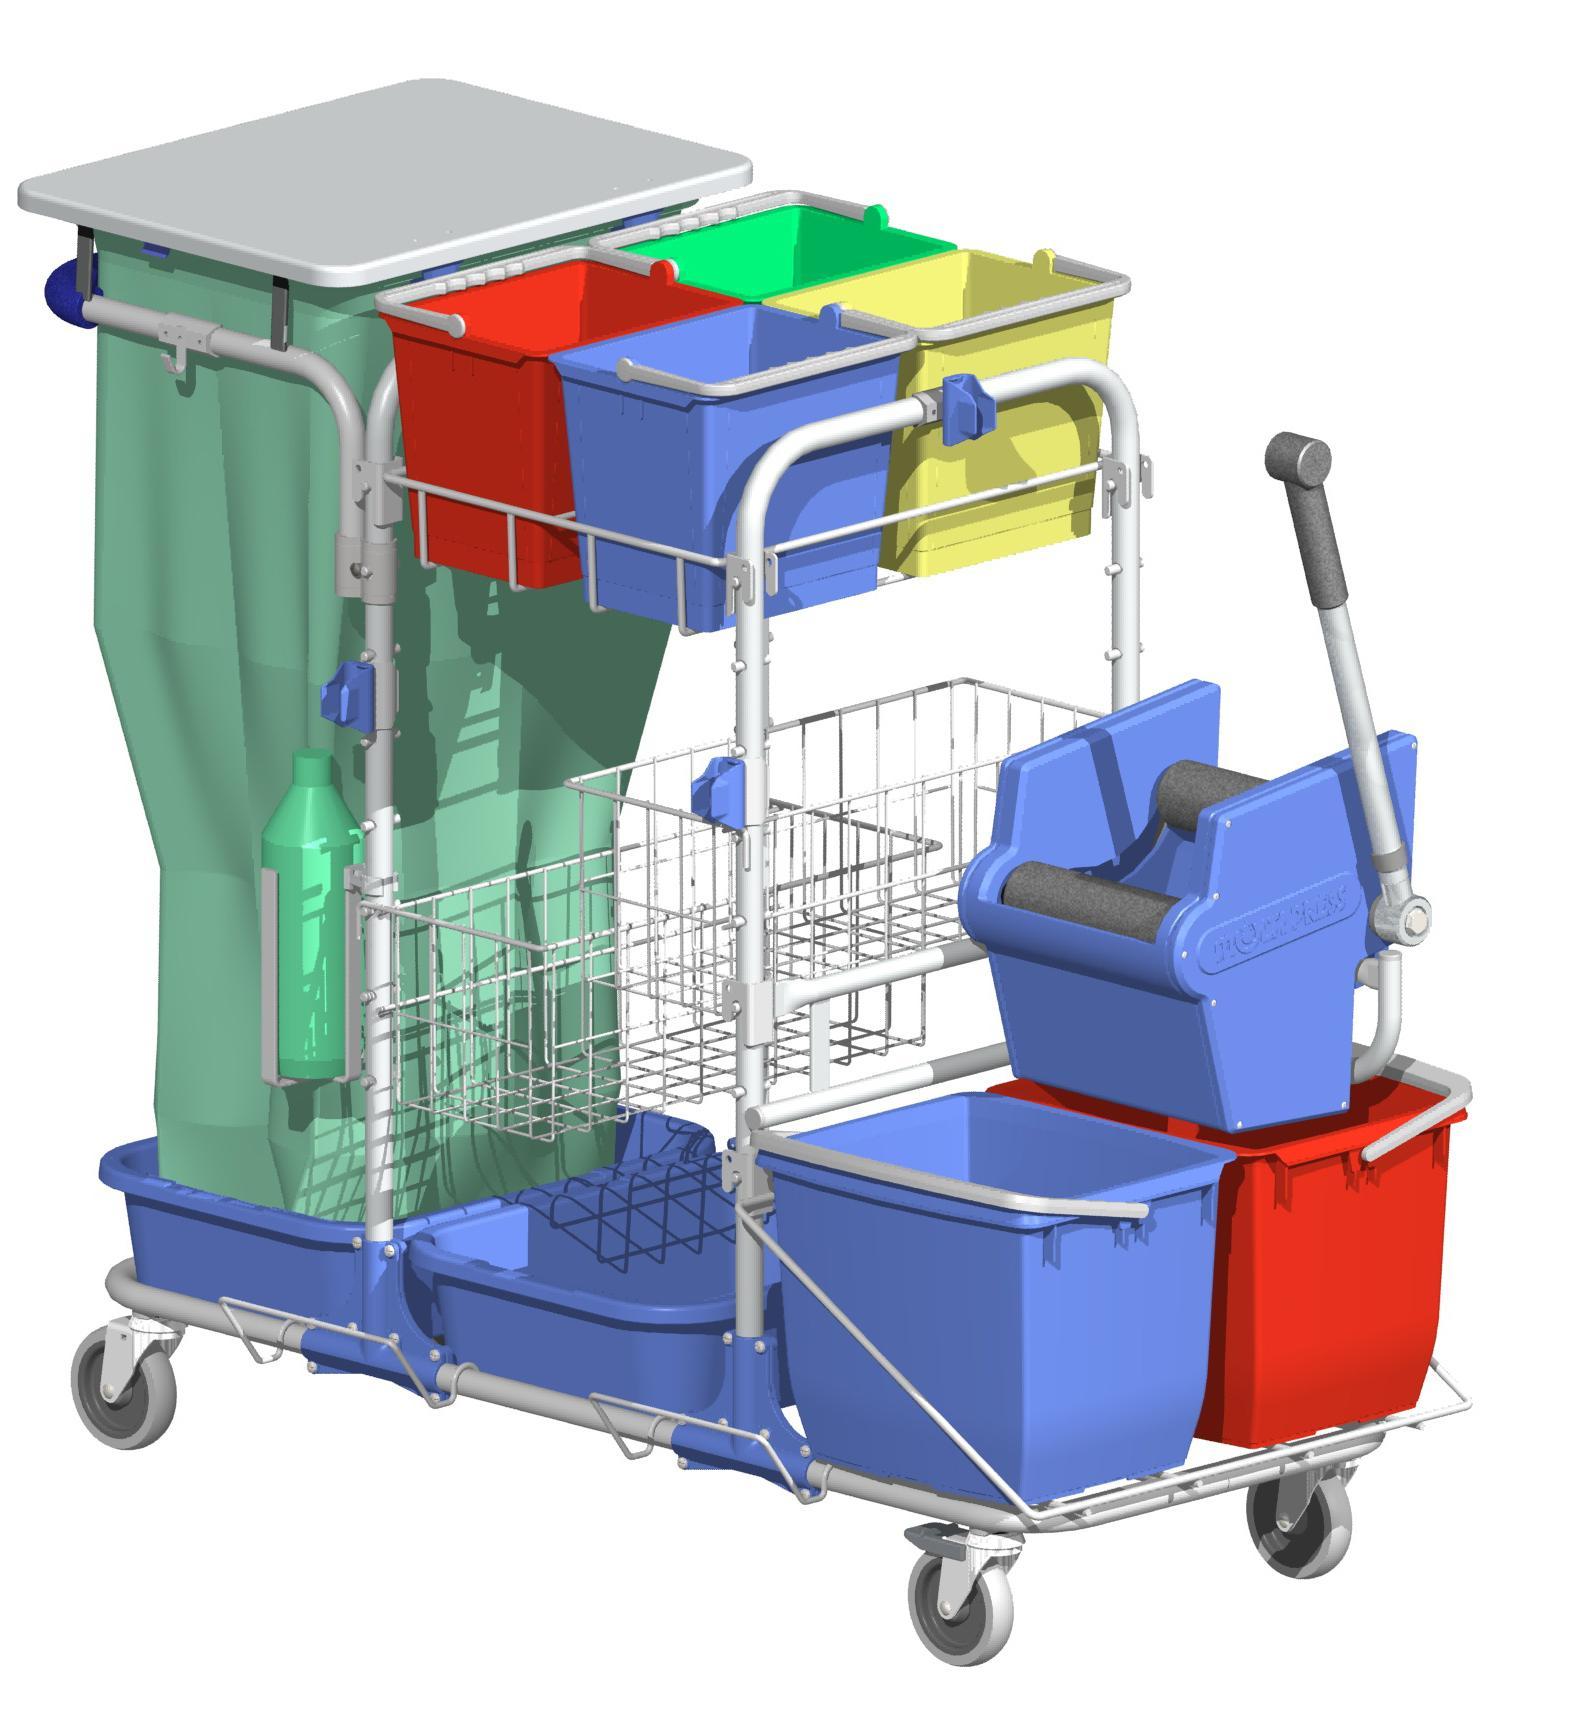 Chariot De Nettoyage Hospitalier Systeme Presse 600426